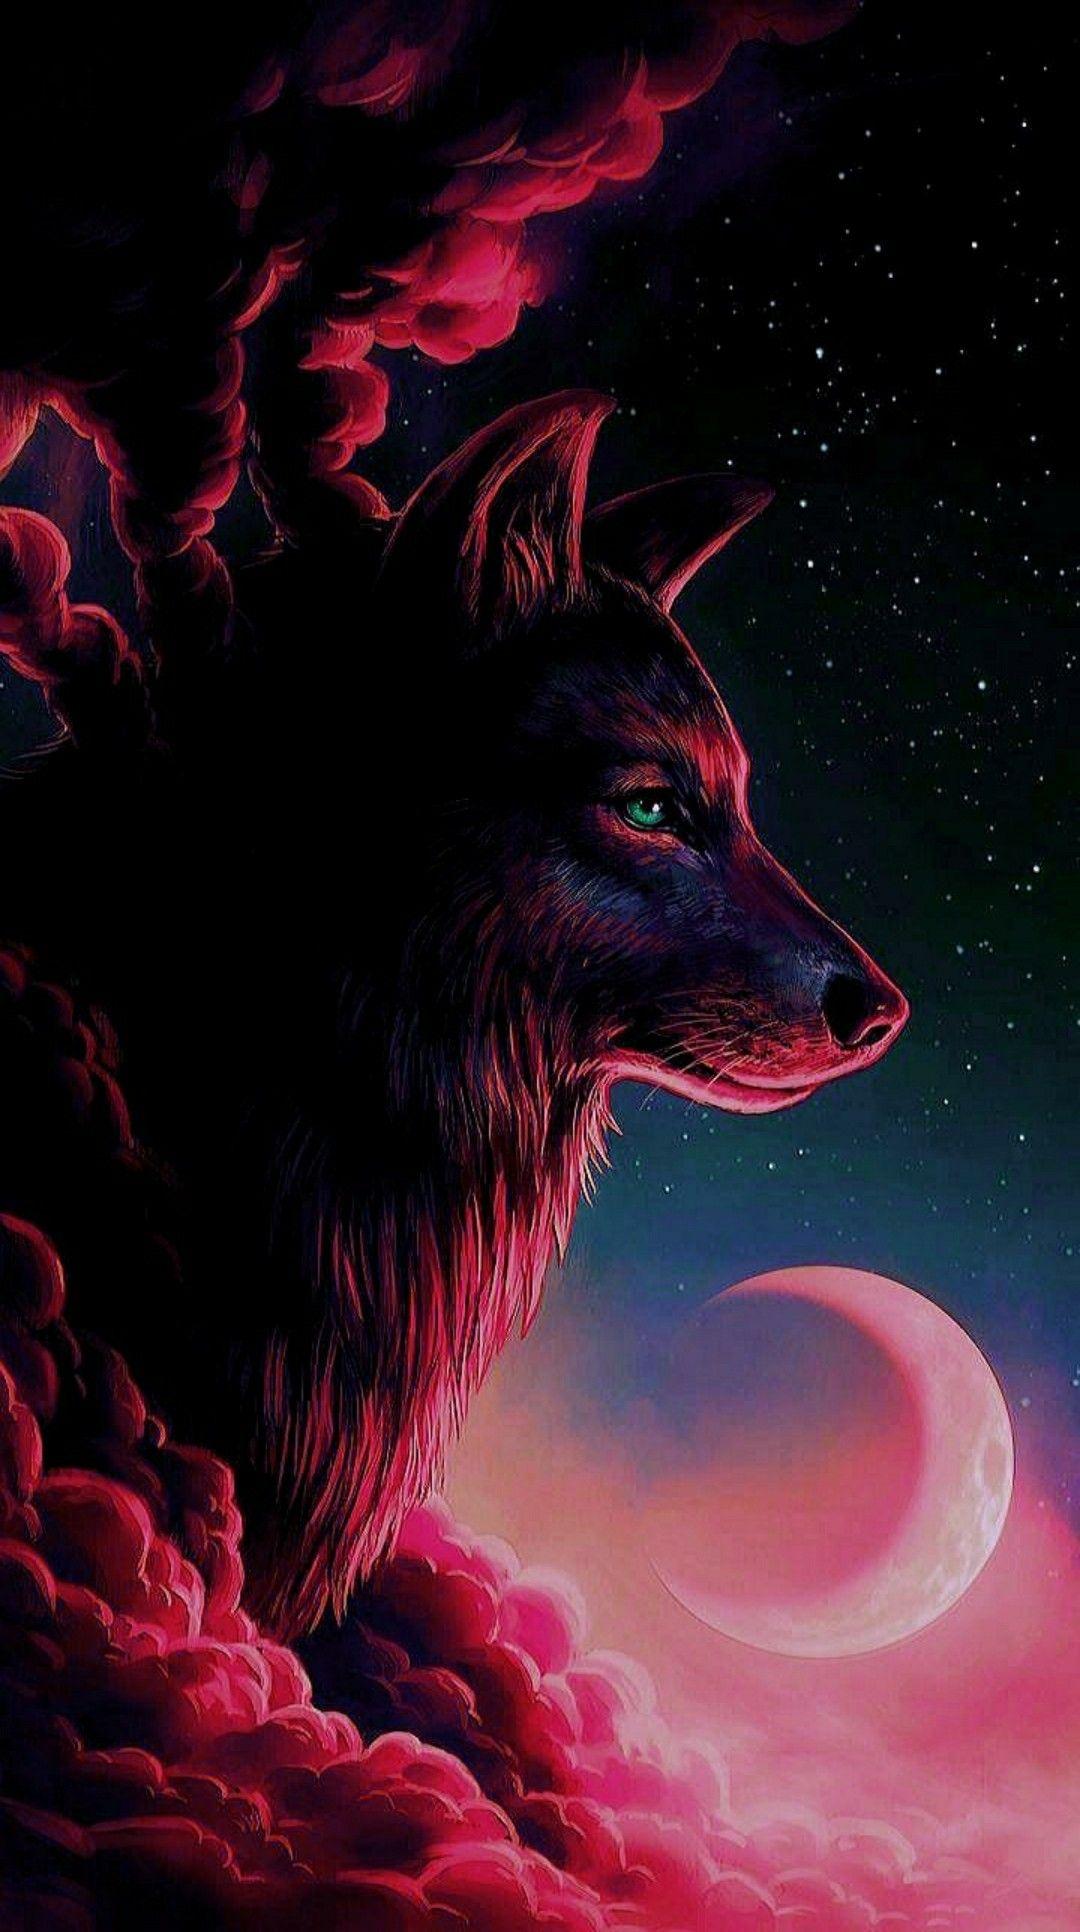 Pin By Bozkurtr On Turk Un Sembolu Kurt Wolf Wallpaper Wolf Painting Wolf Artwork